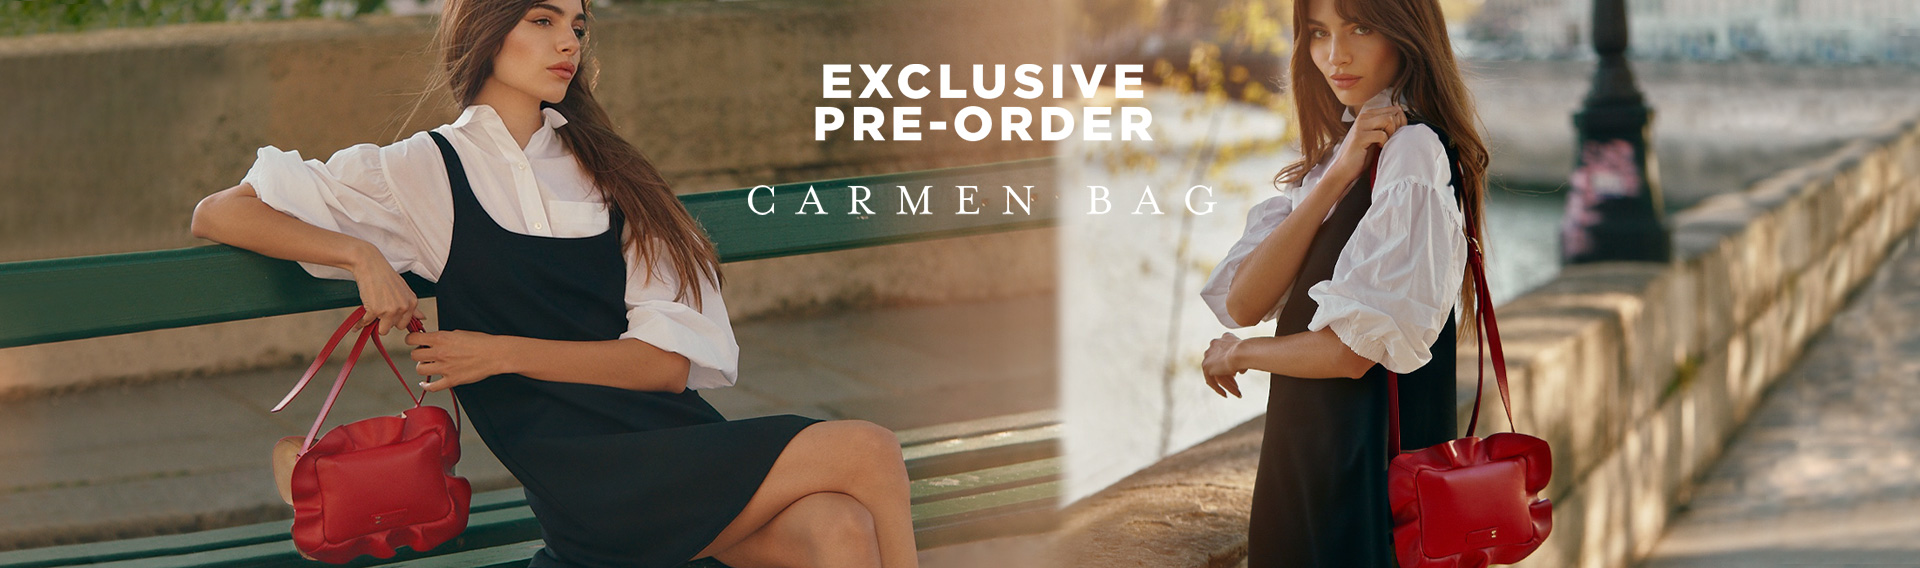 Exclusive Pre-Order Carmen bag